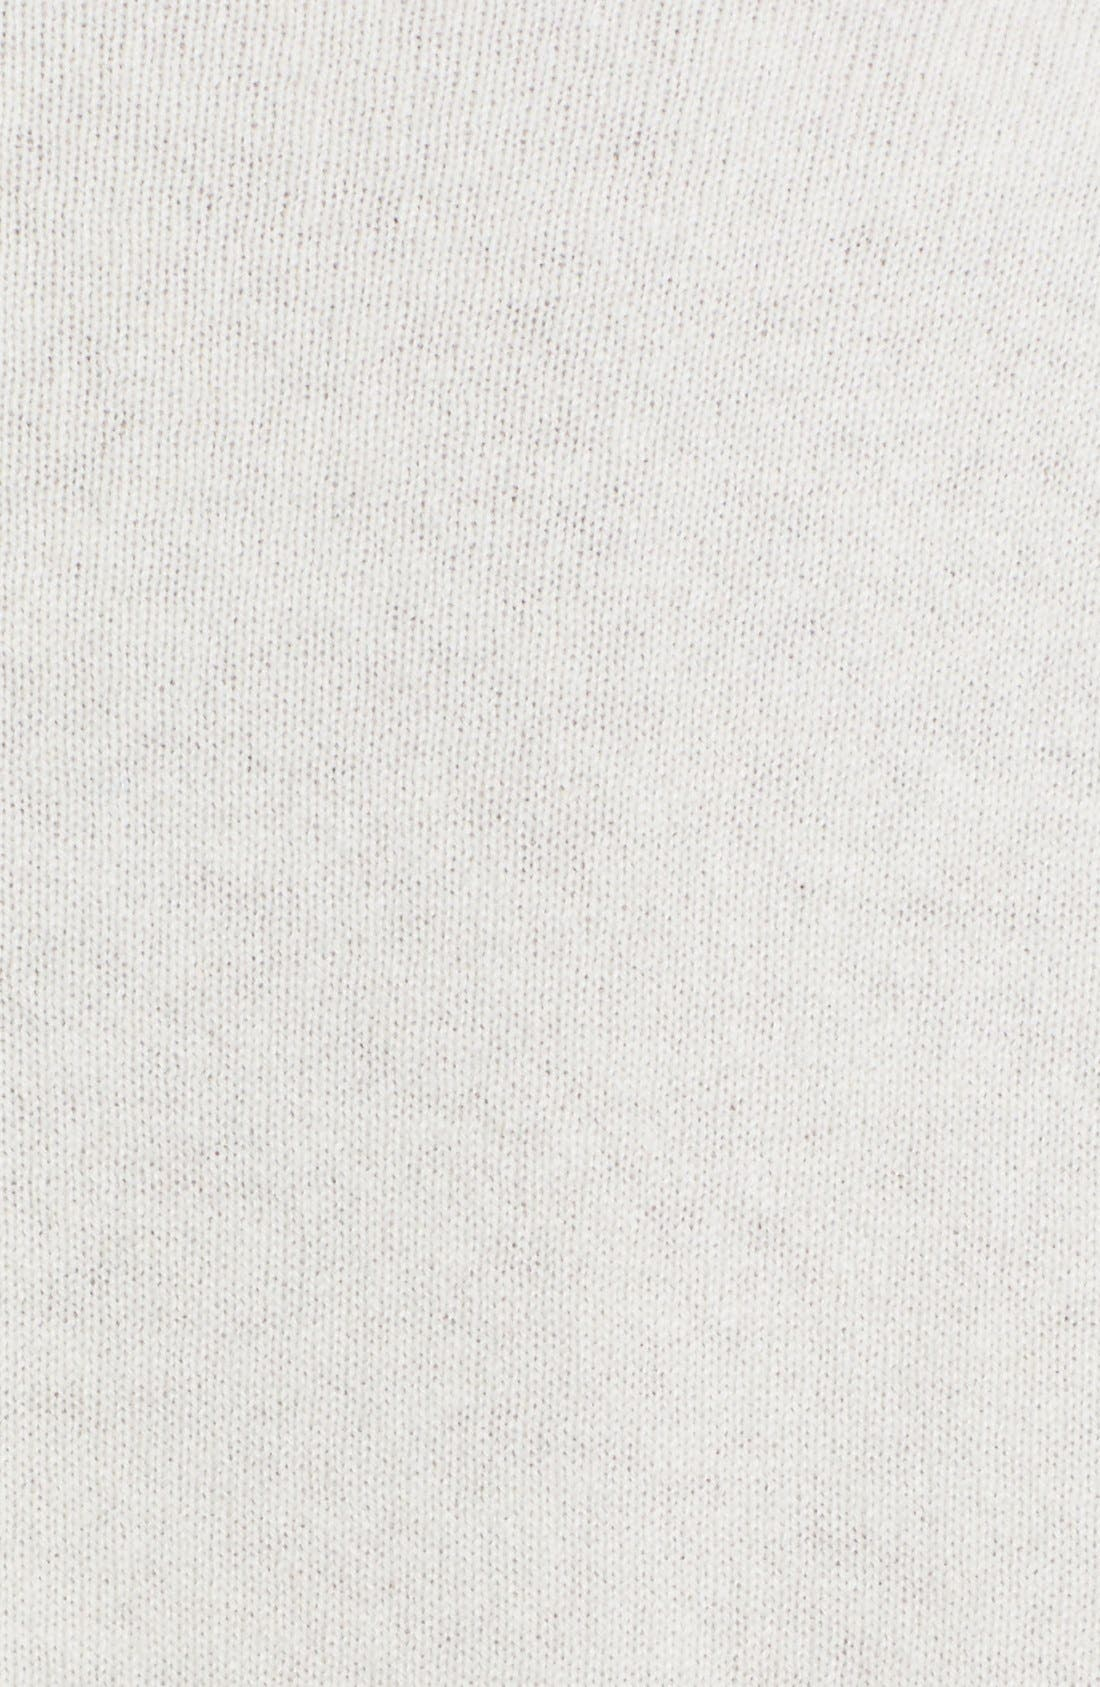 Shirttail Cashmere Sweater,                             Alternate thumbnail 5, color,                             101